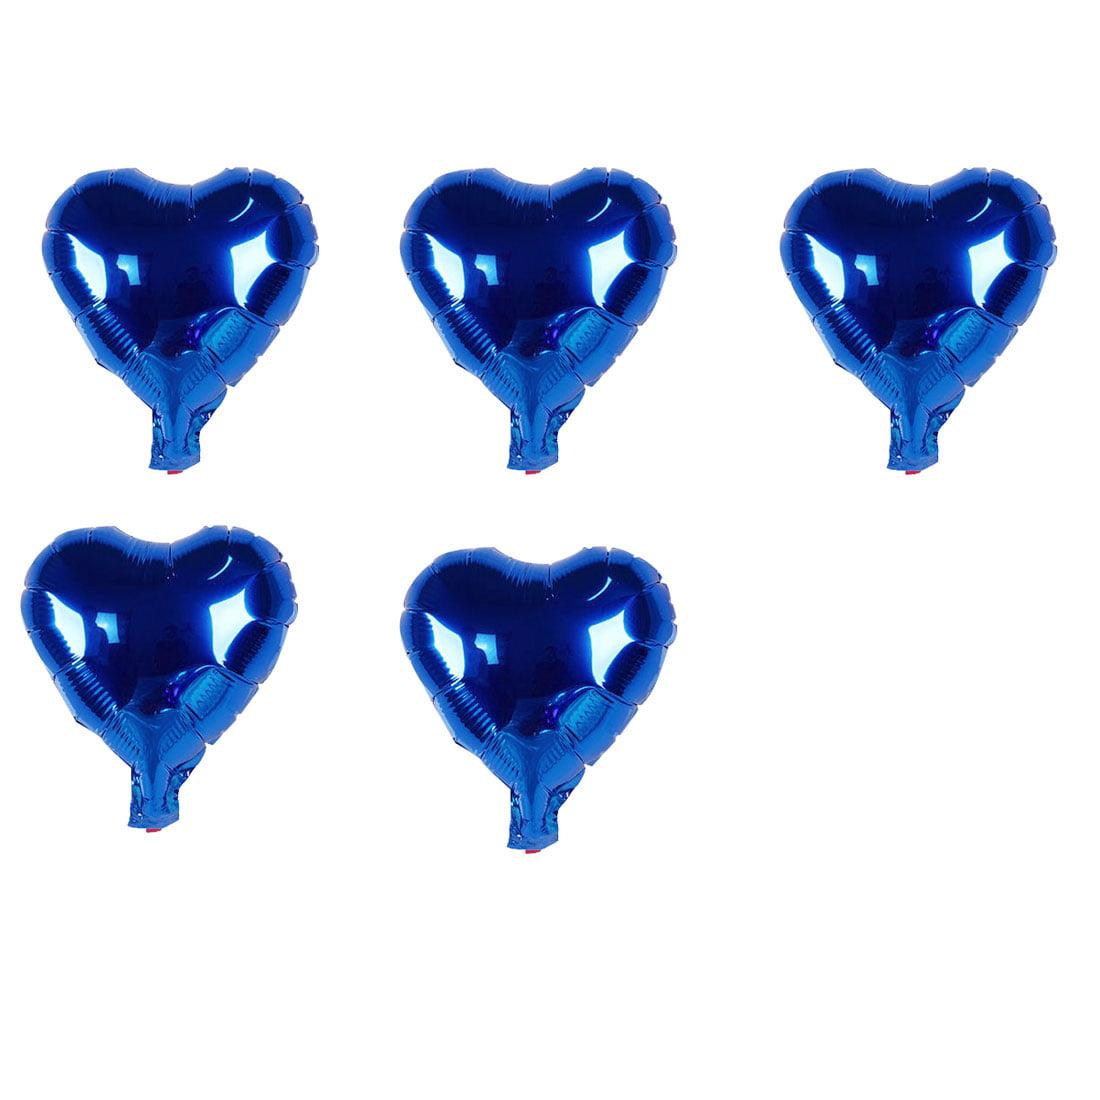 Unique Bargains Foil Heart Shape Balloon Birthday Wedding Decor Blue 5 Inches 5 Pcs